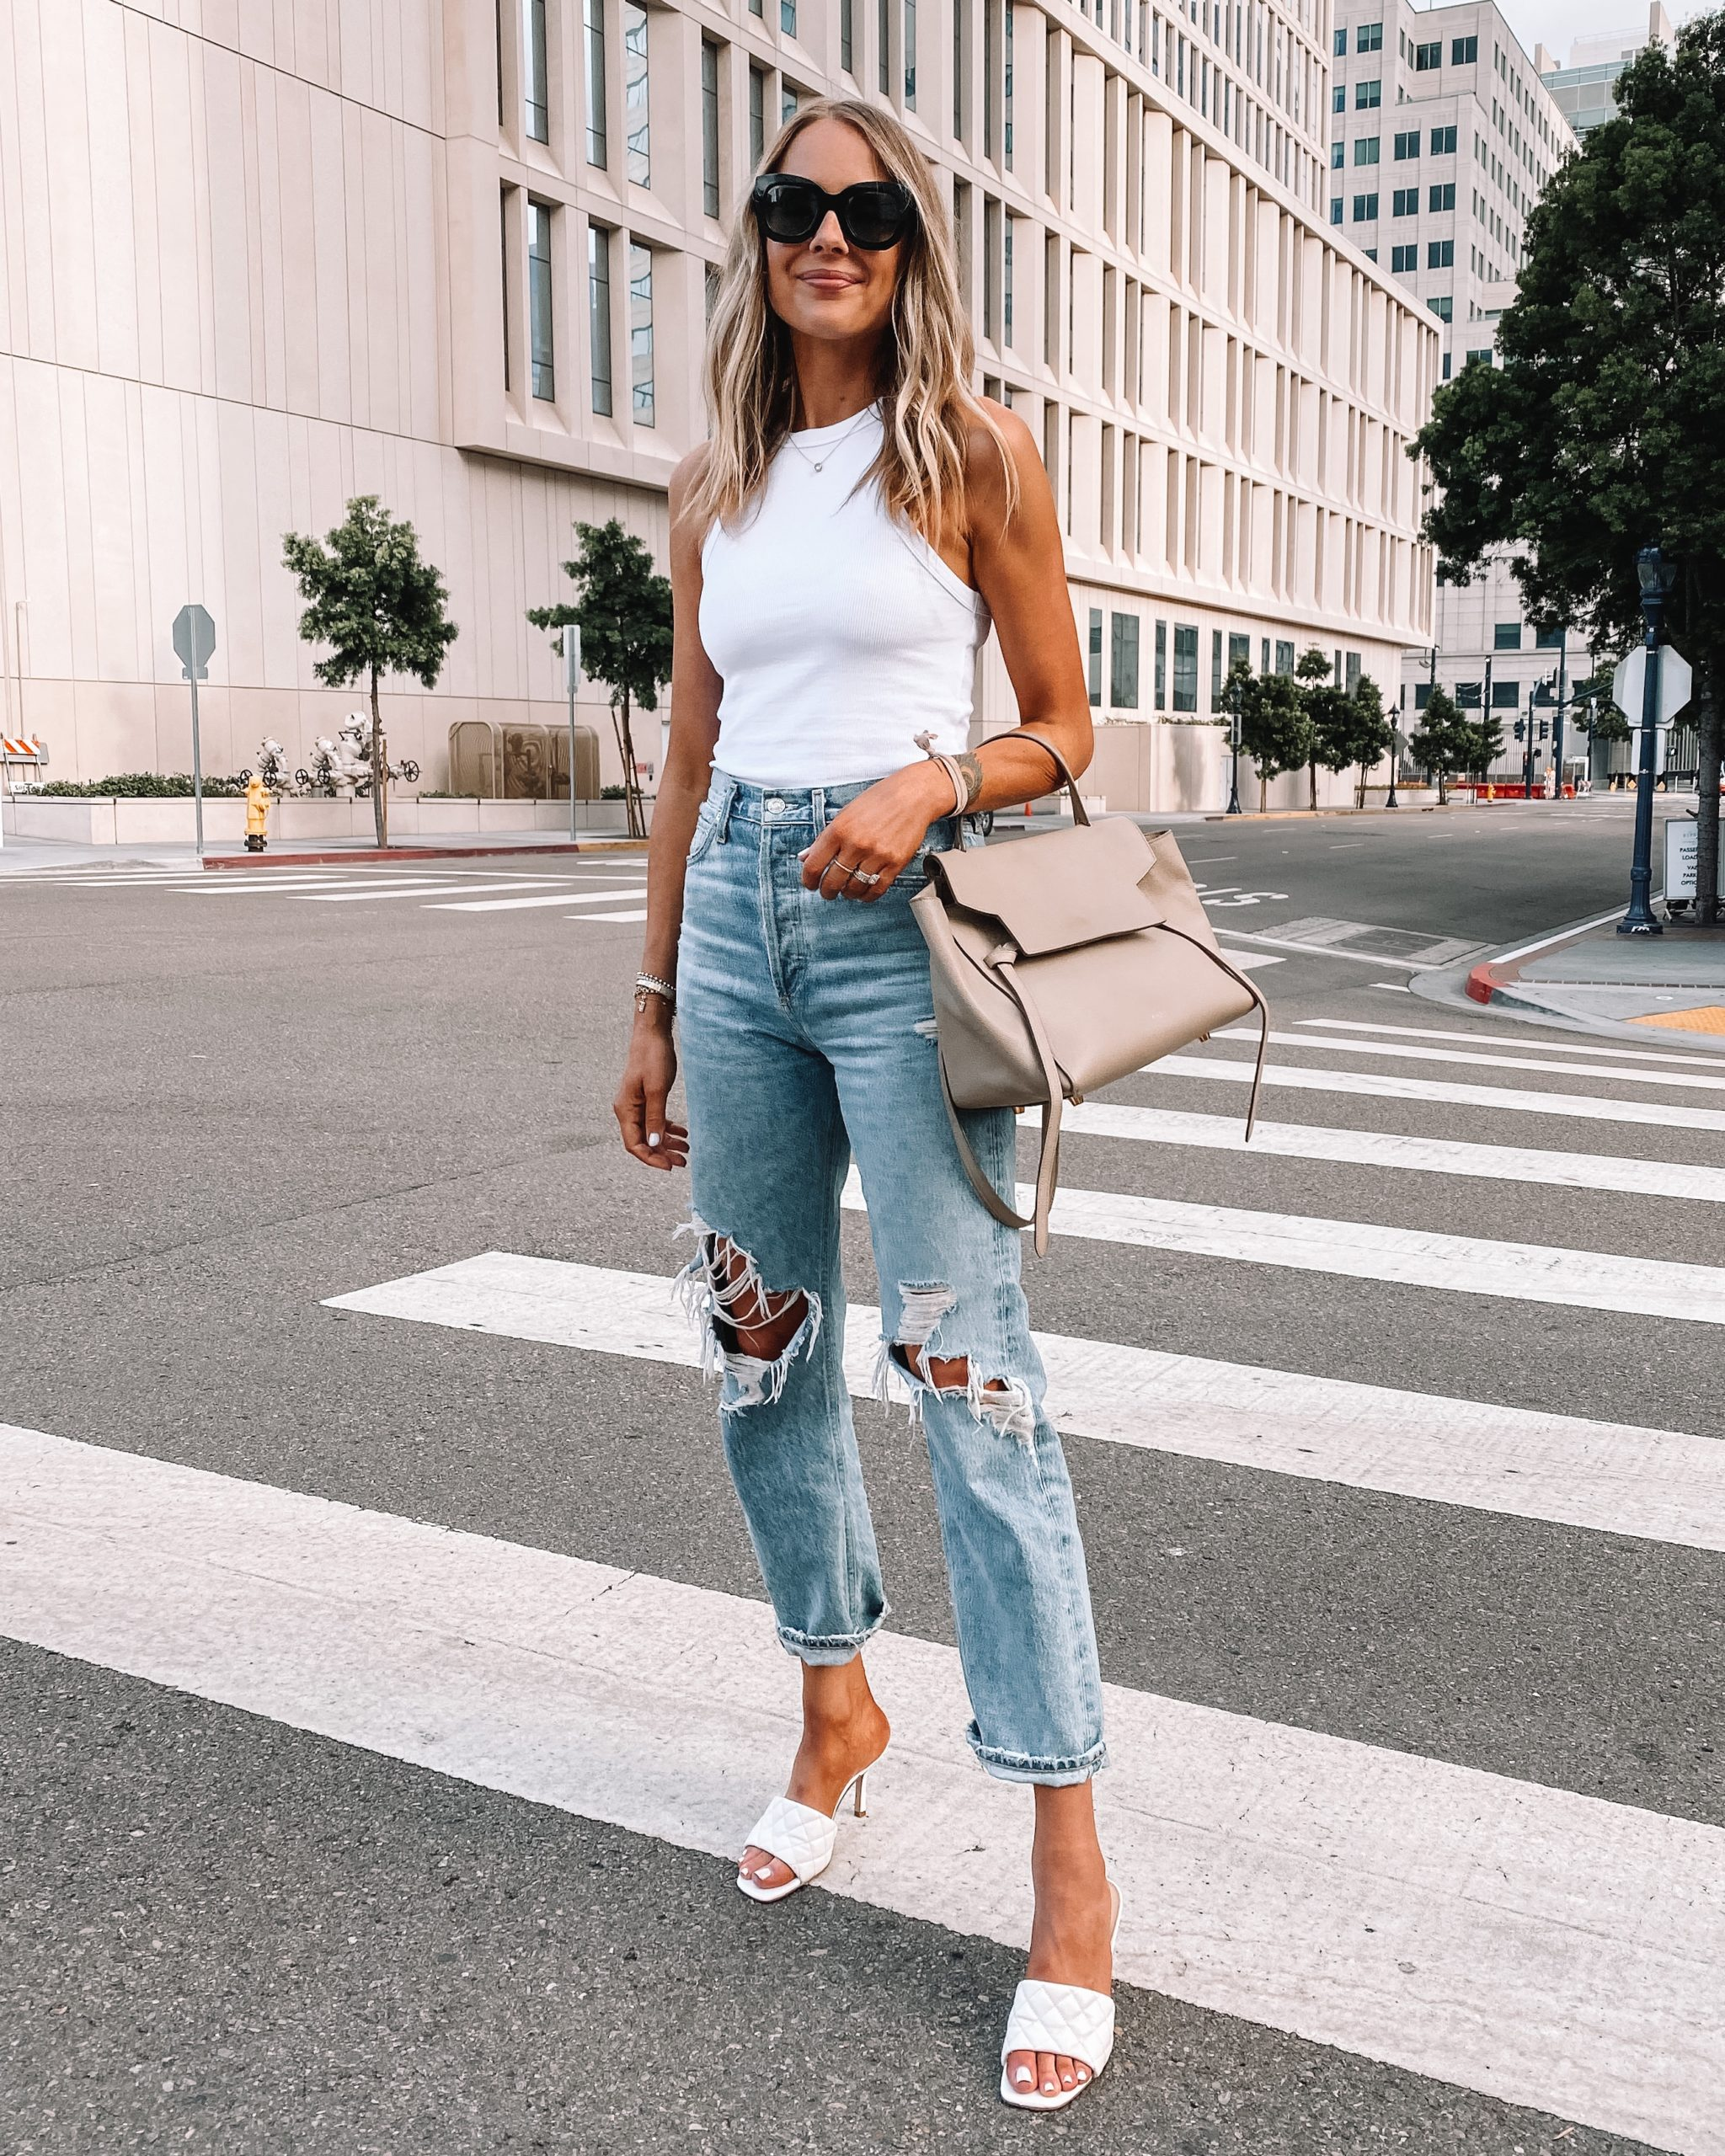 Fashion Jackson Wearing Anine Bing White Tank Agolde Ripped Jeans White Heeled Sandals